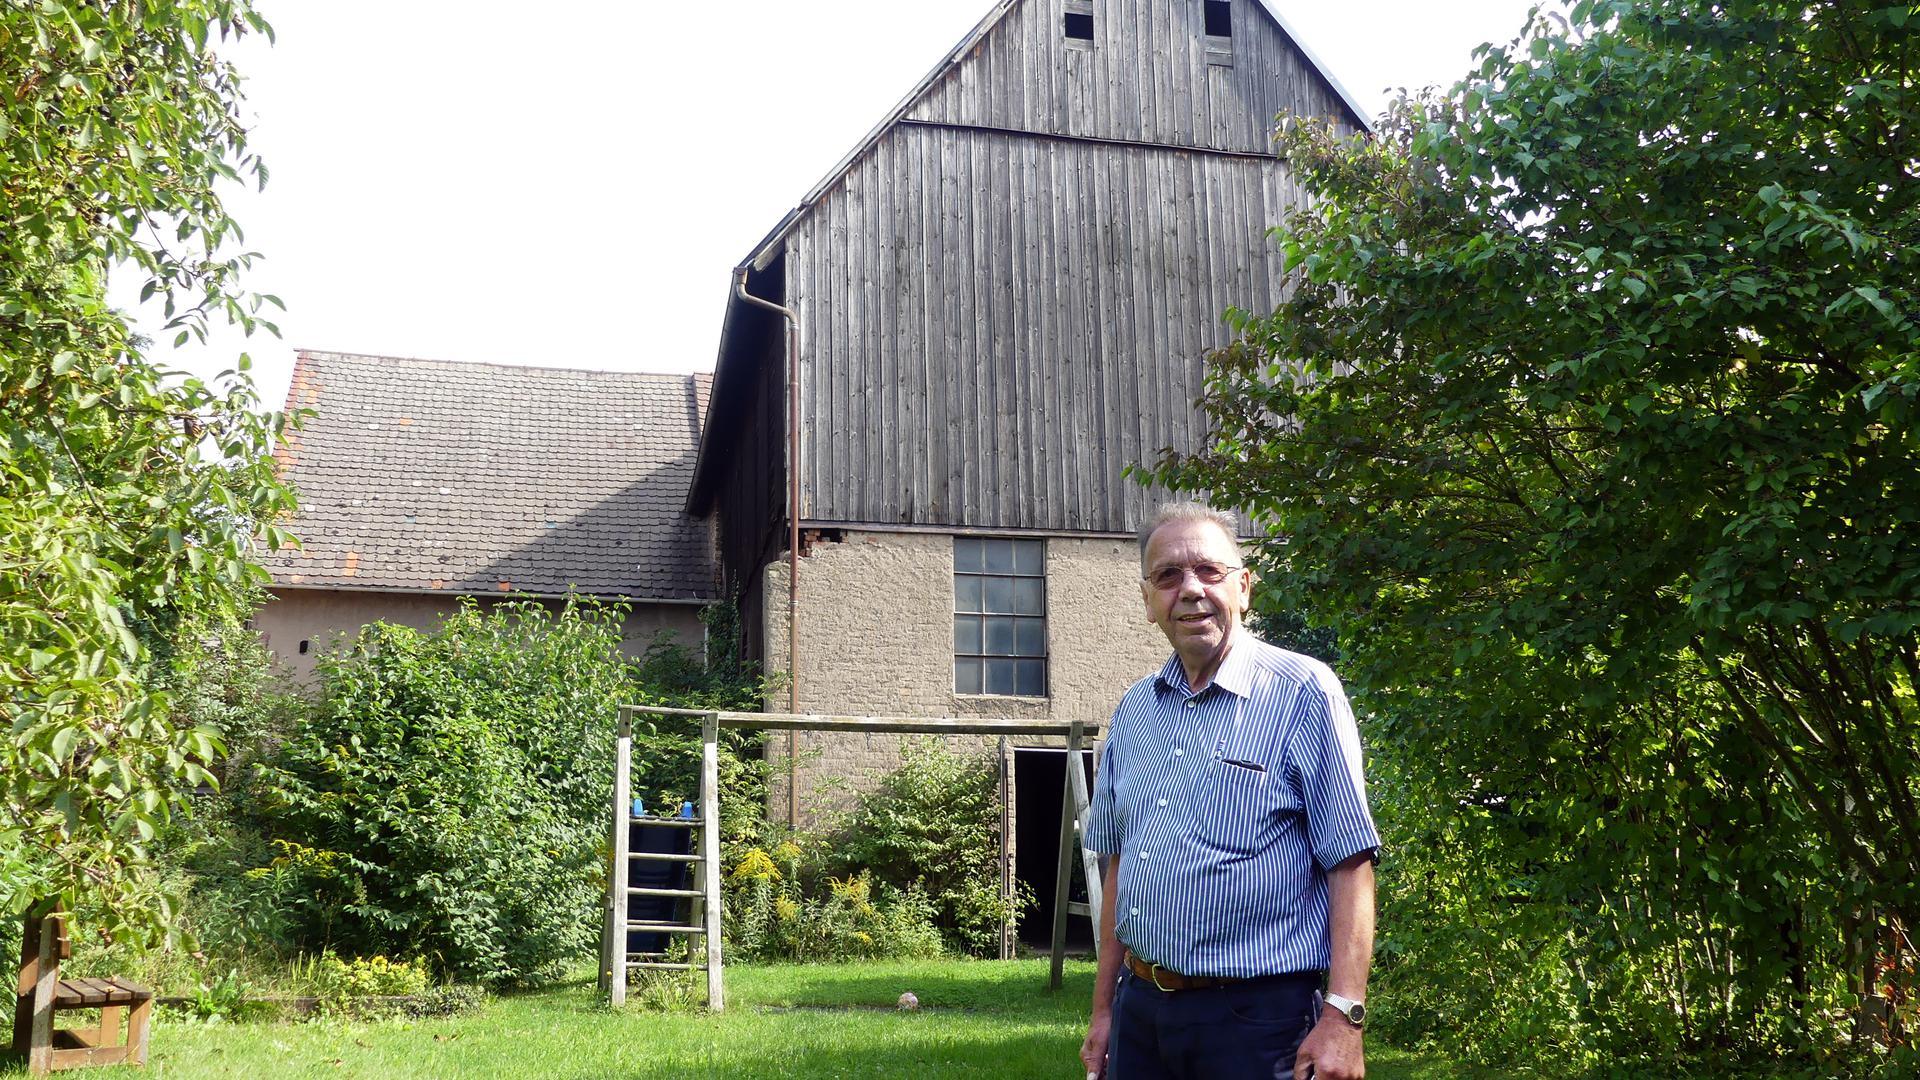 Manfred Raupp Staffort